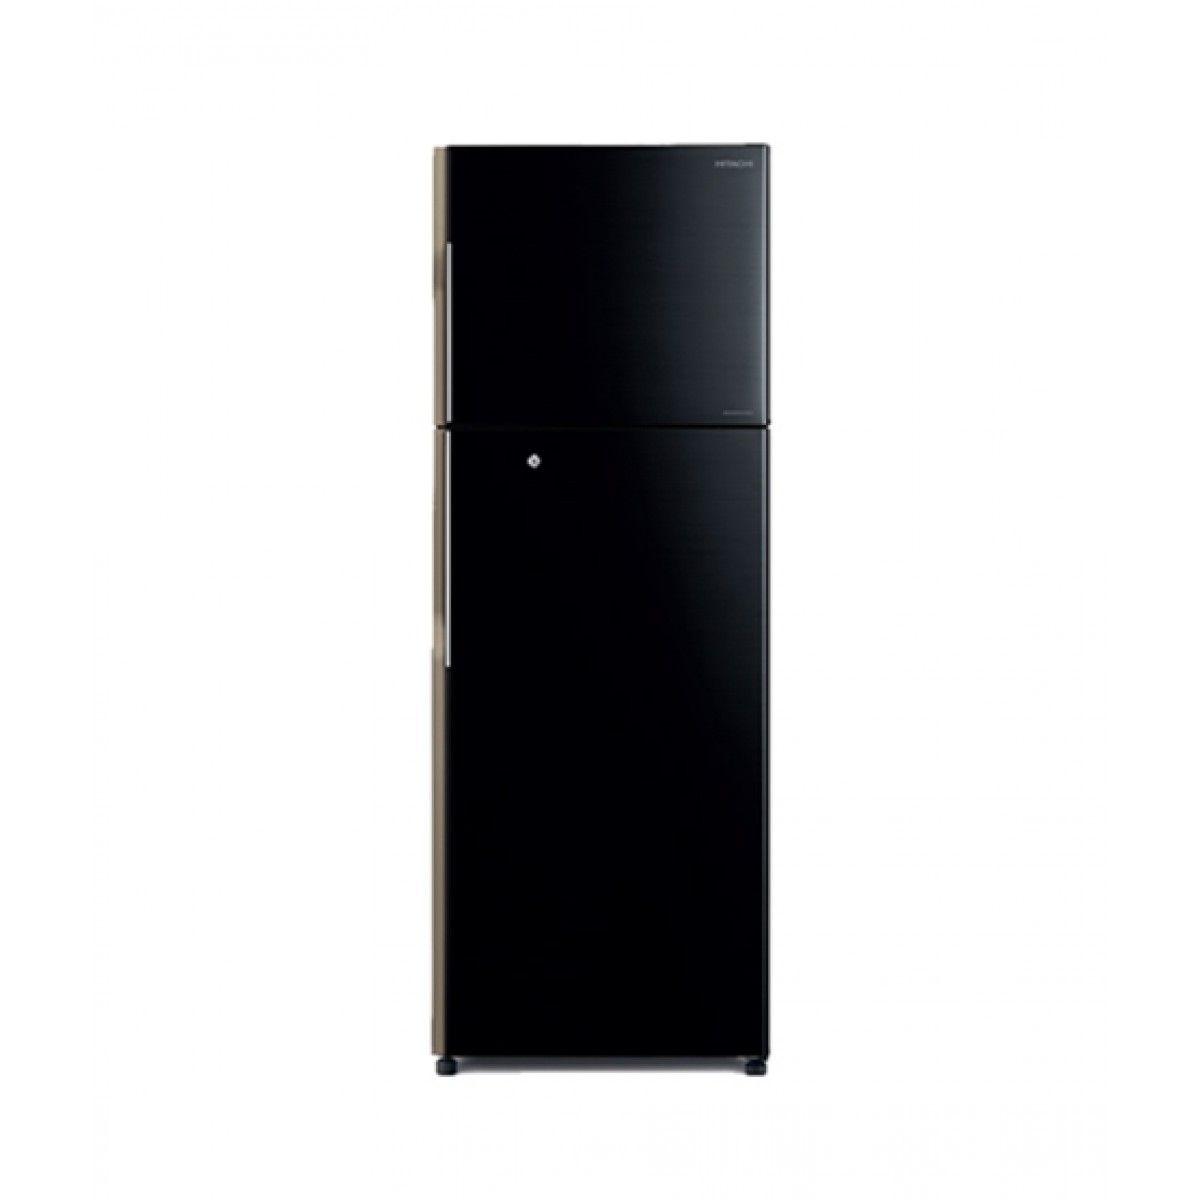 Hitachi (R-H350P4PBK) Freezer-on-Top 11 cu ft Refrigerator